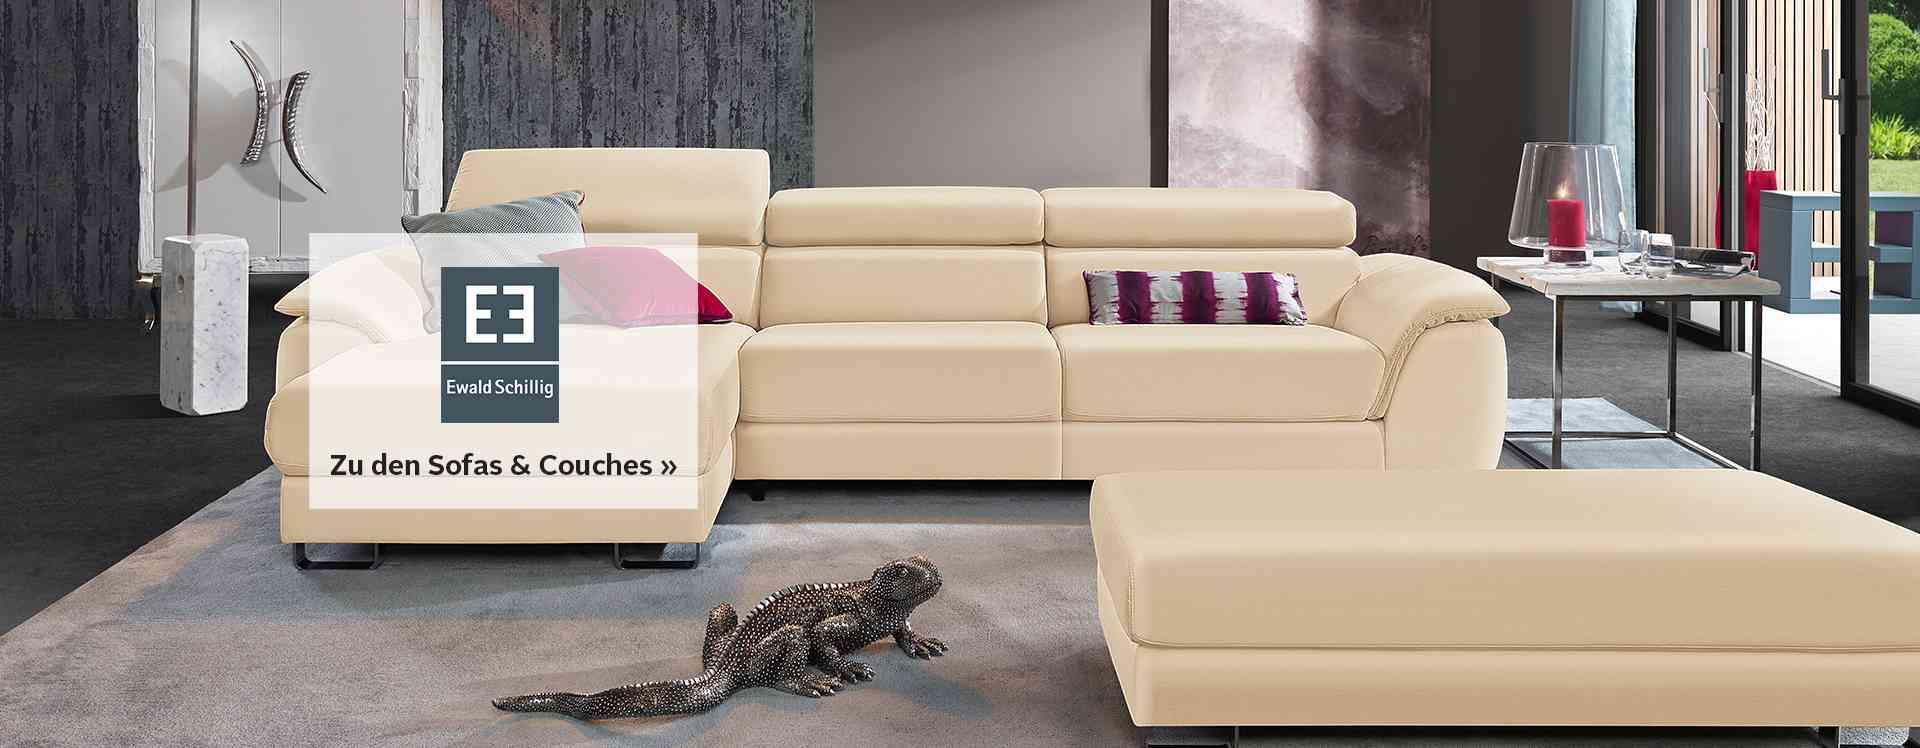 ewald schillig m bel online kaufen otto. Black Bedroom Furniture Sets. Home Design Ideas